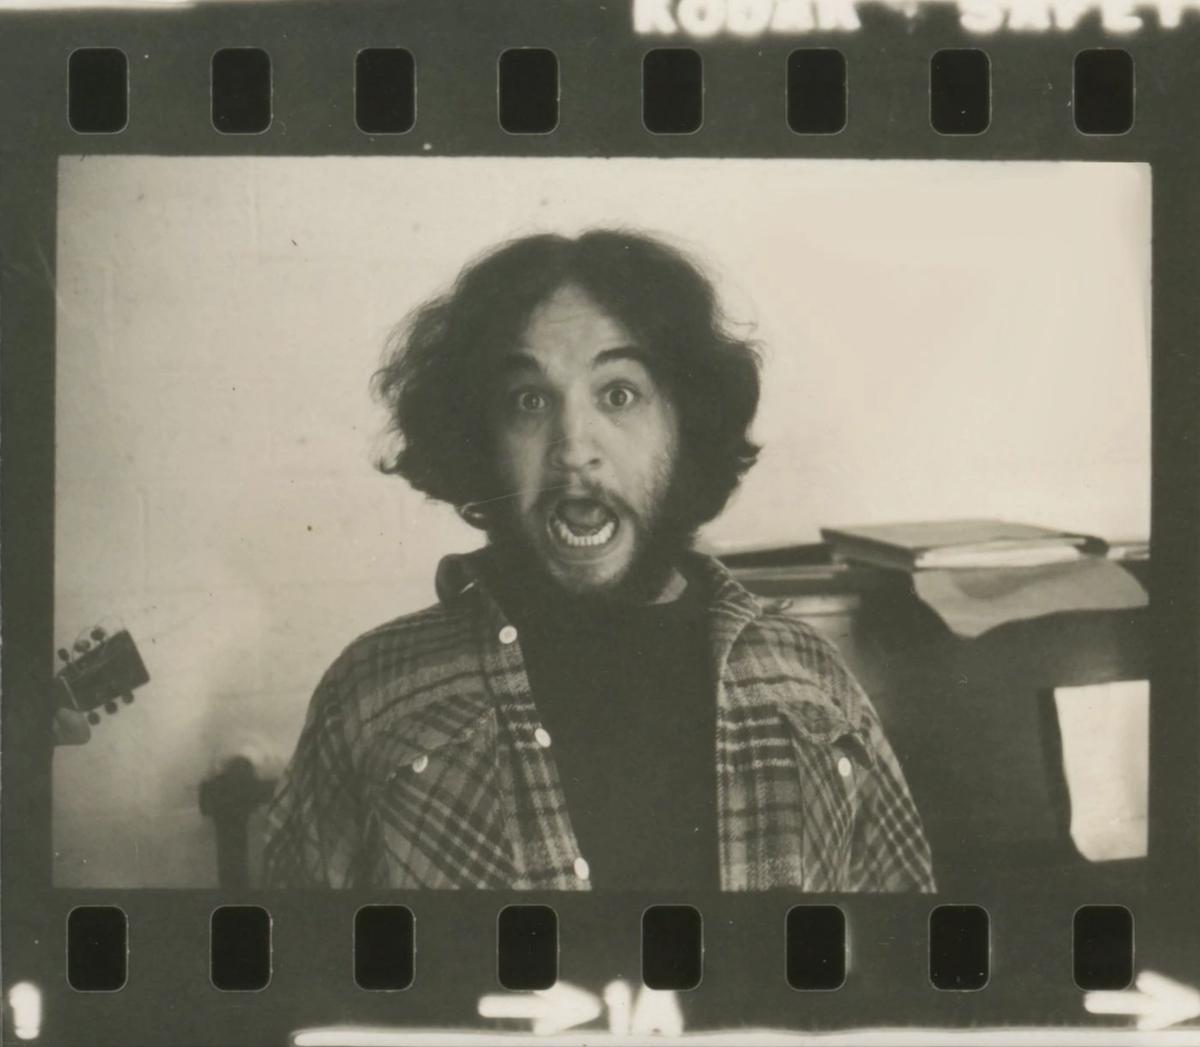 John Belushi documentary